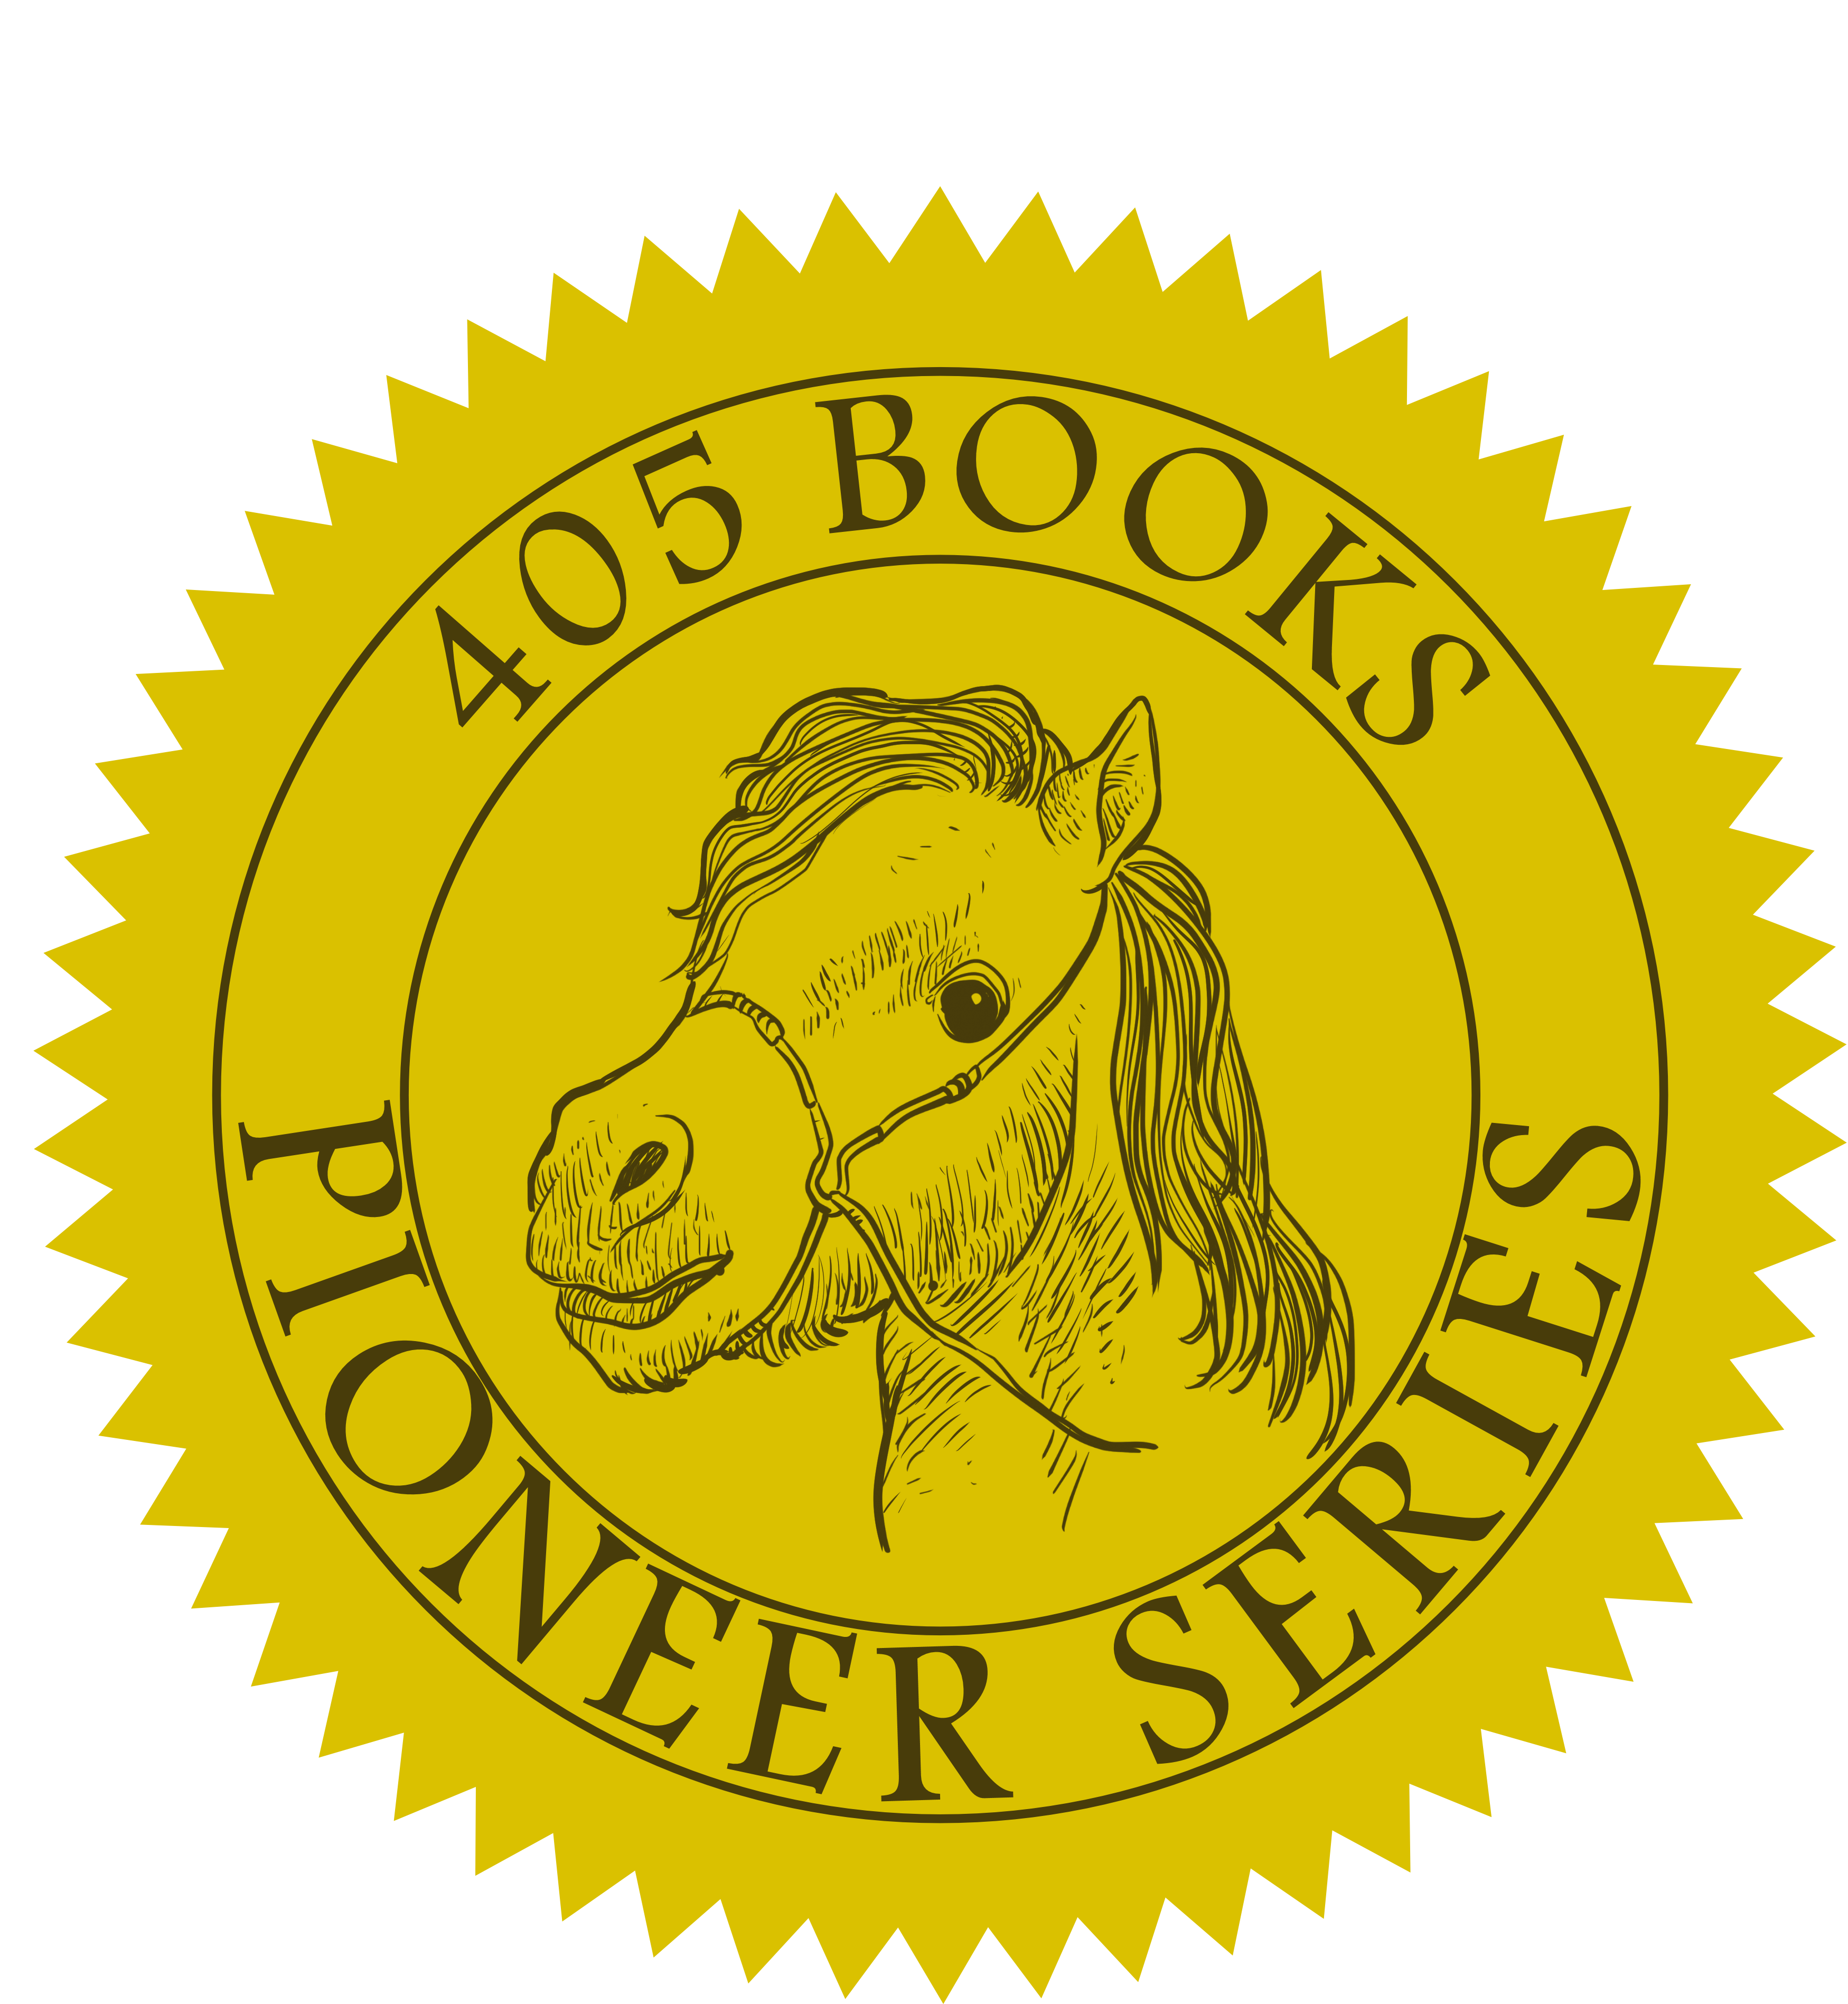 405 Books